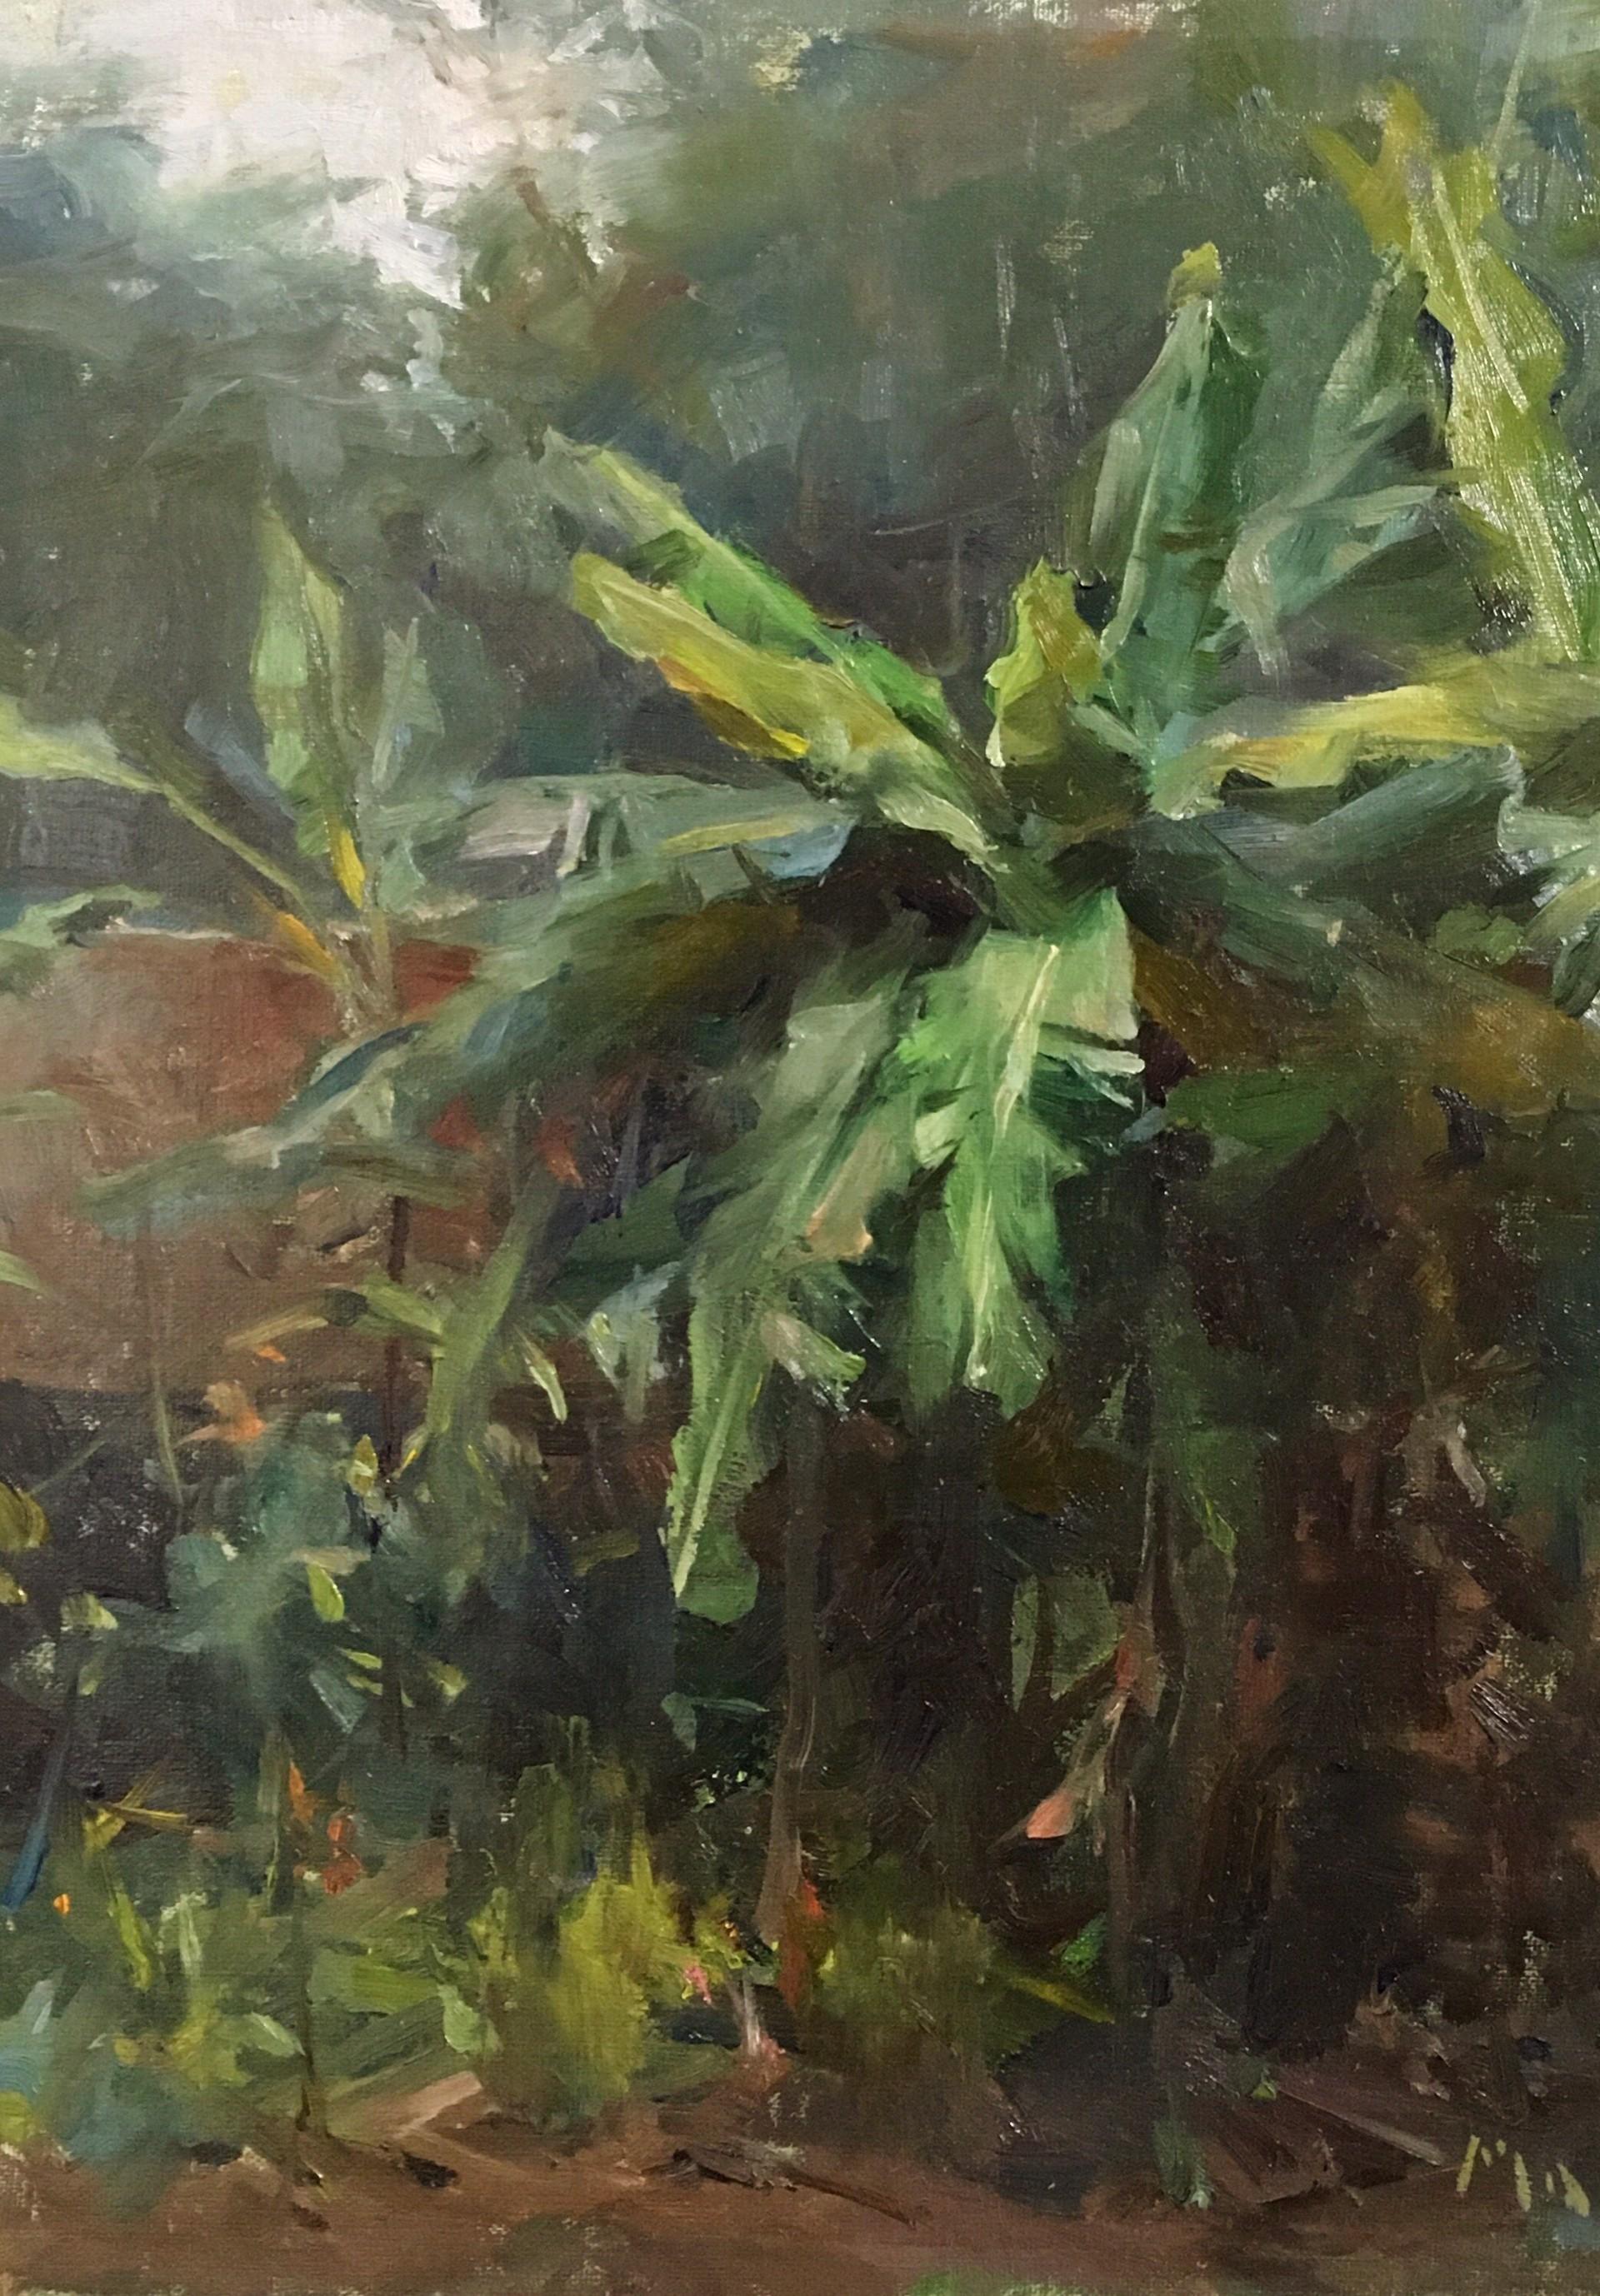 Banana Trees by Jiantan Temple by Kyle Ma